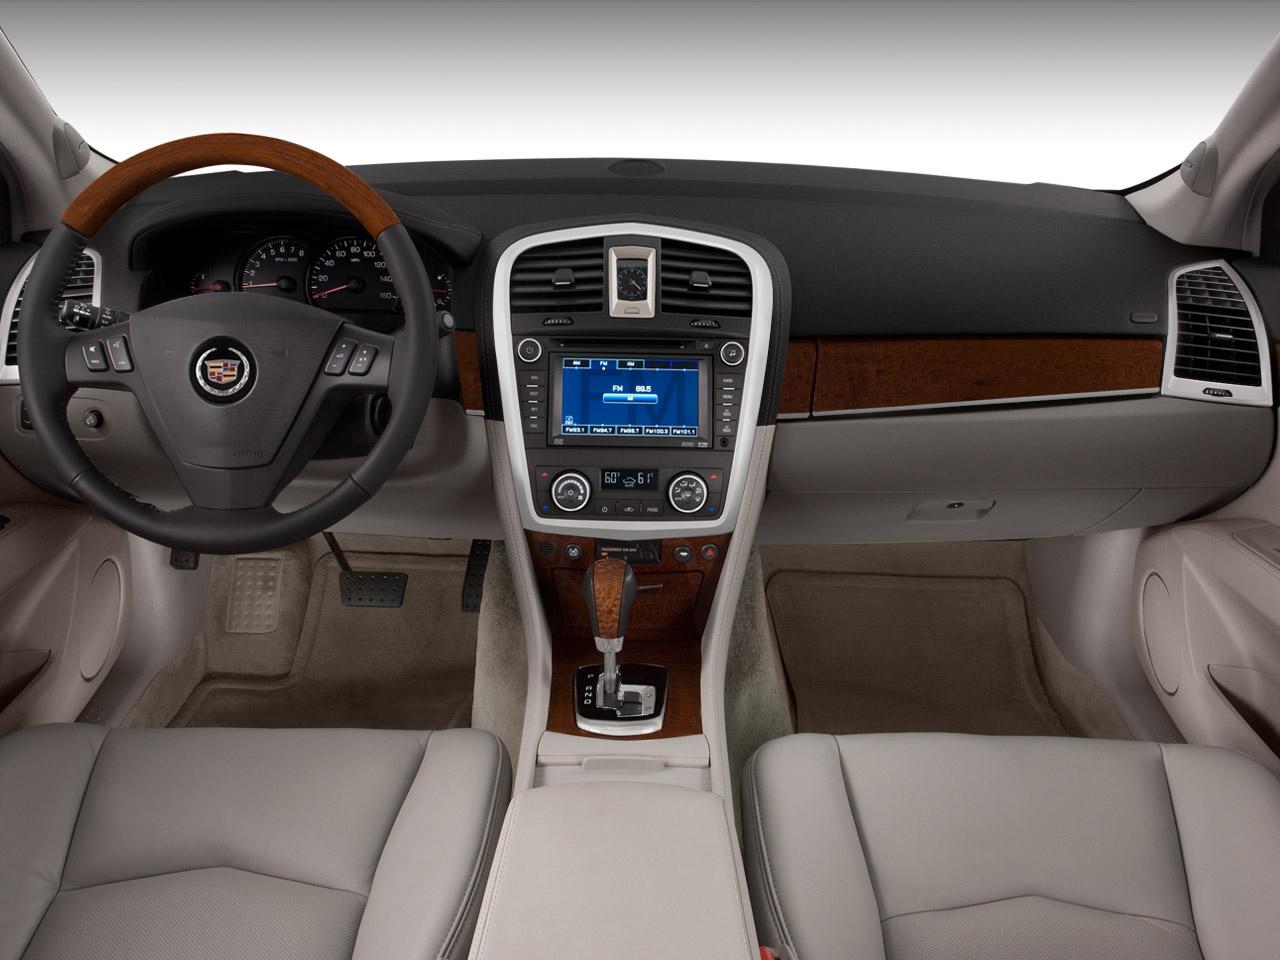 Cadillac SRX 2007 foto - 3